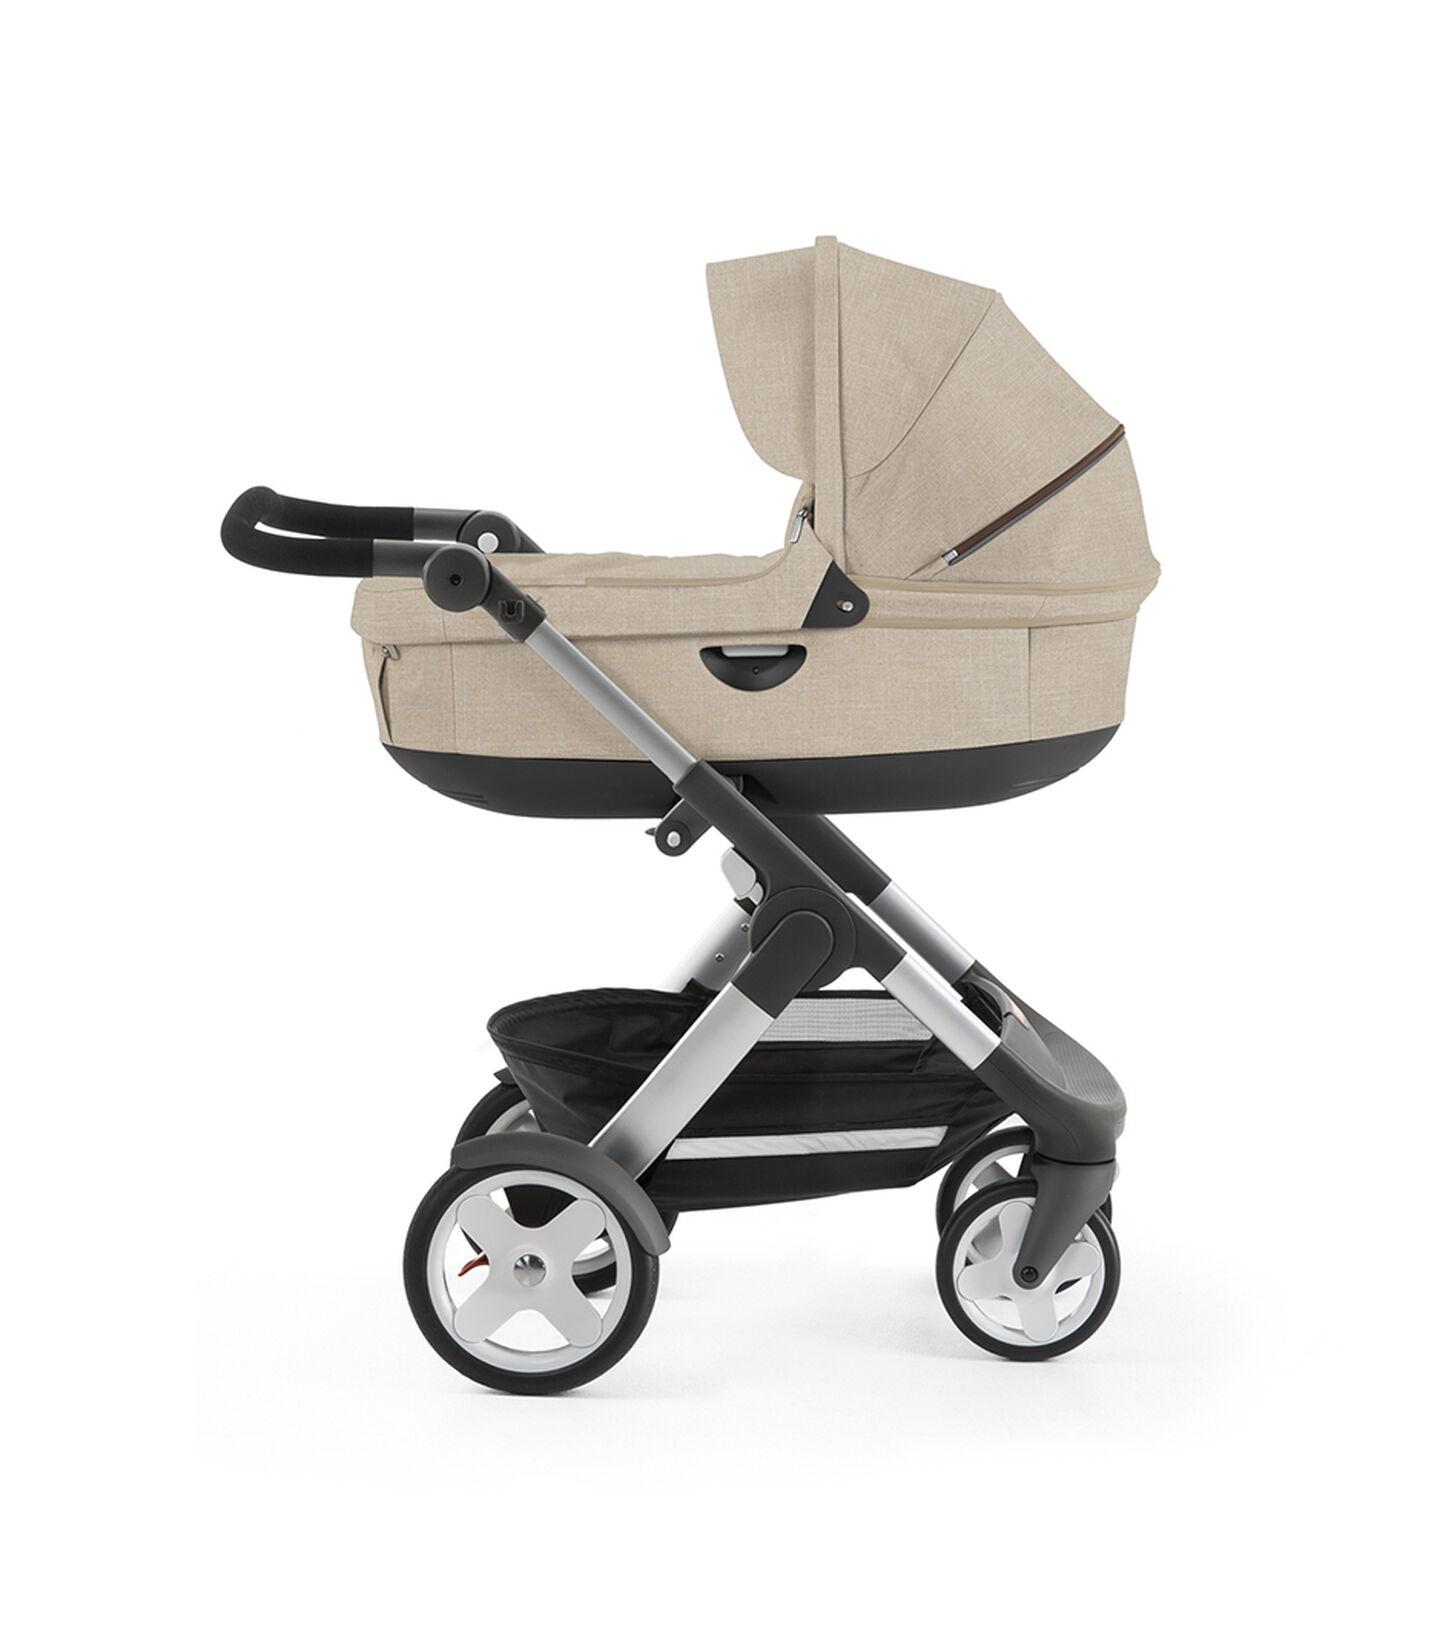 Stokke® Trailz™ with Stokke® Stroller Seat, Red. Classic Wheels.